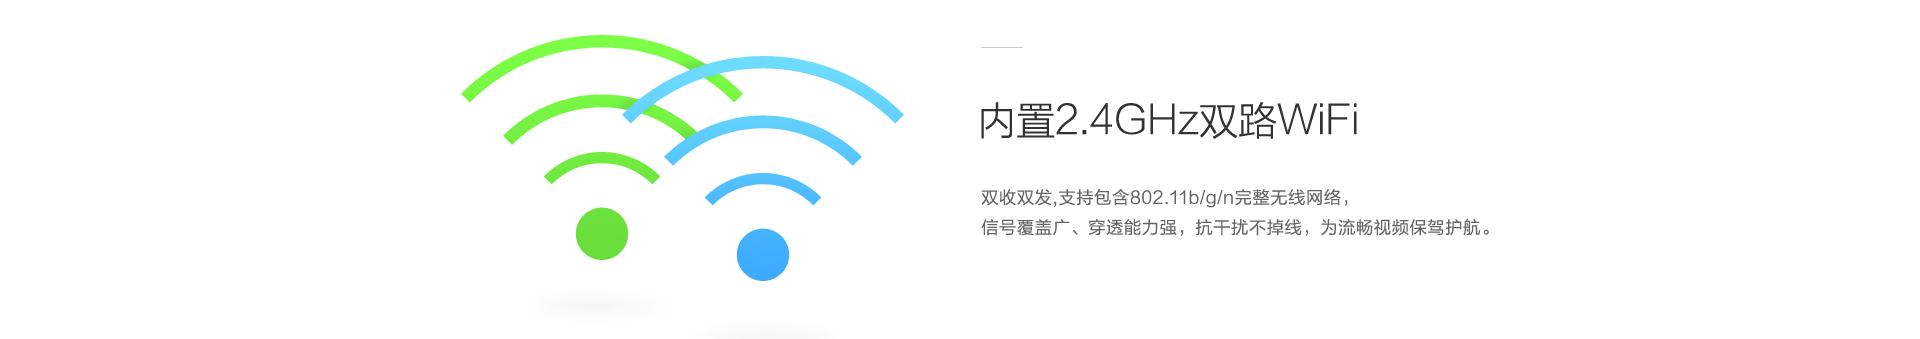 ppshop商城 - pptv-50p